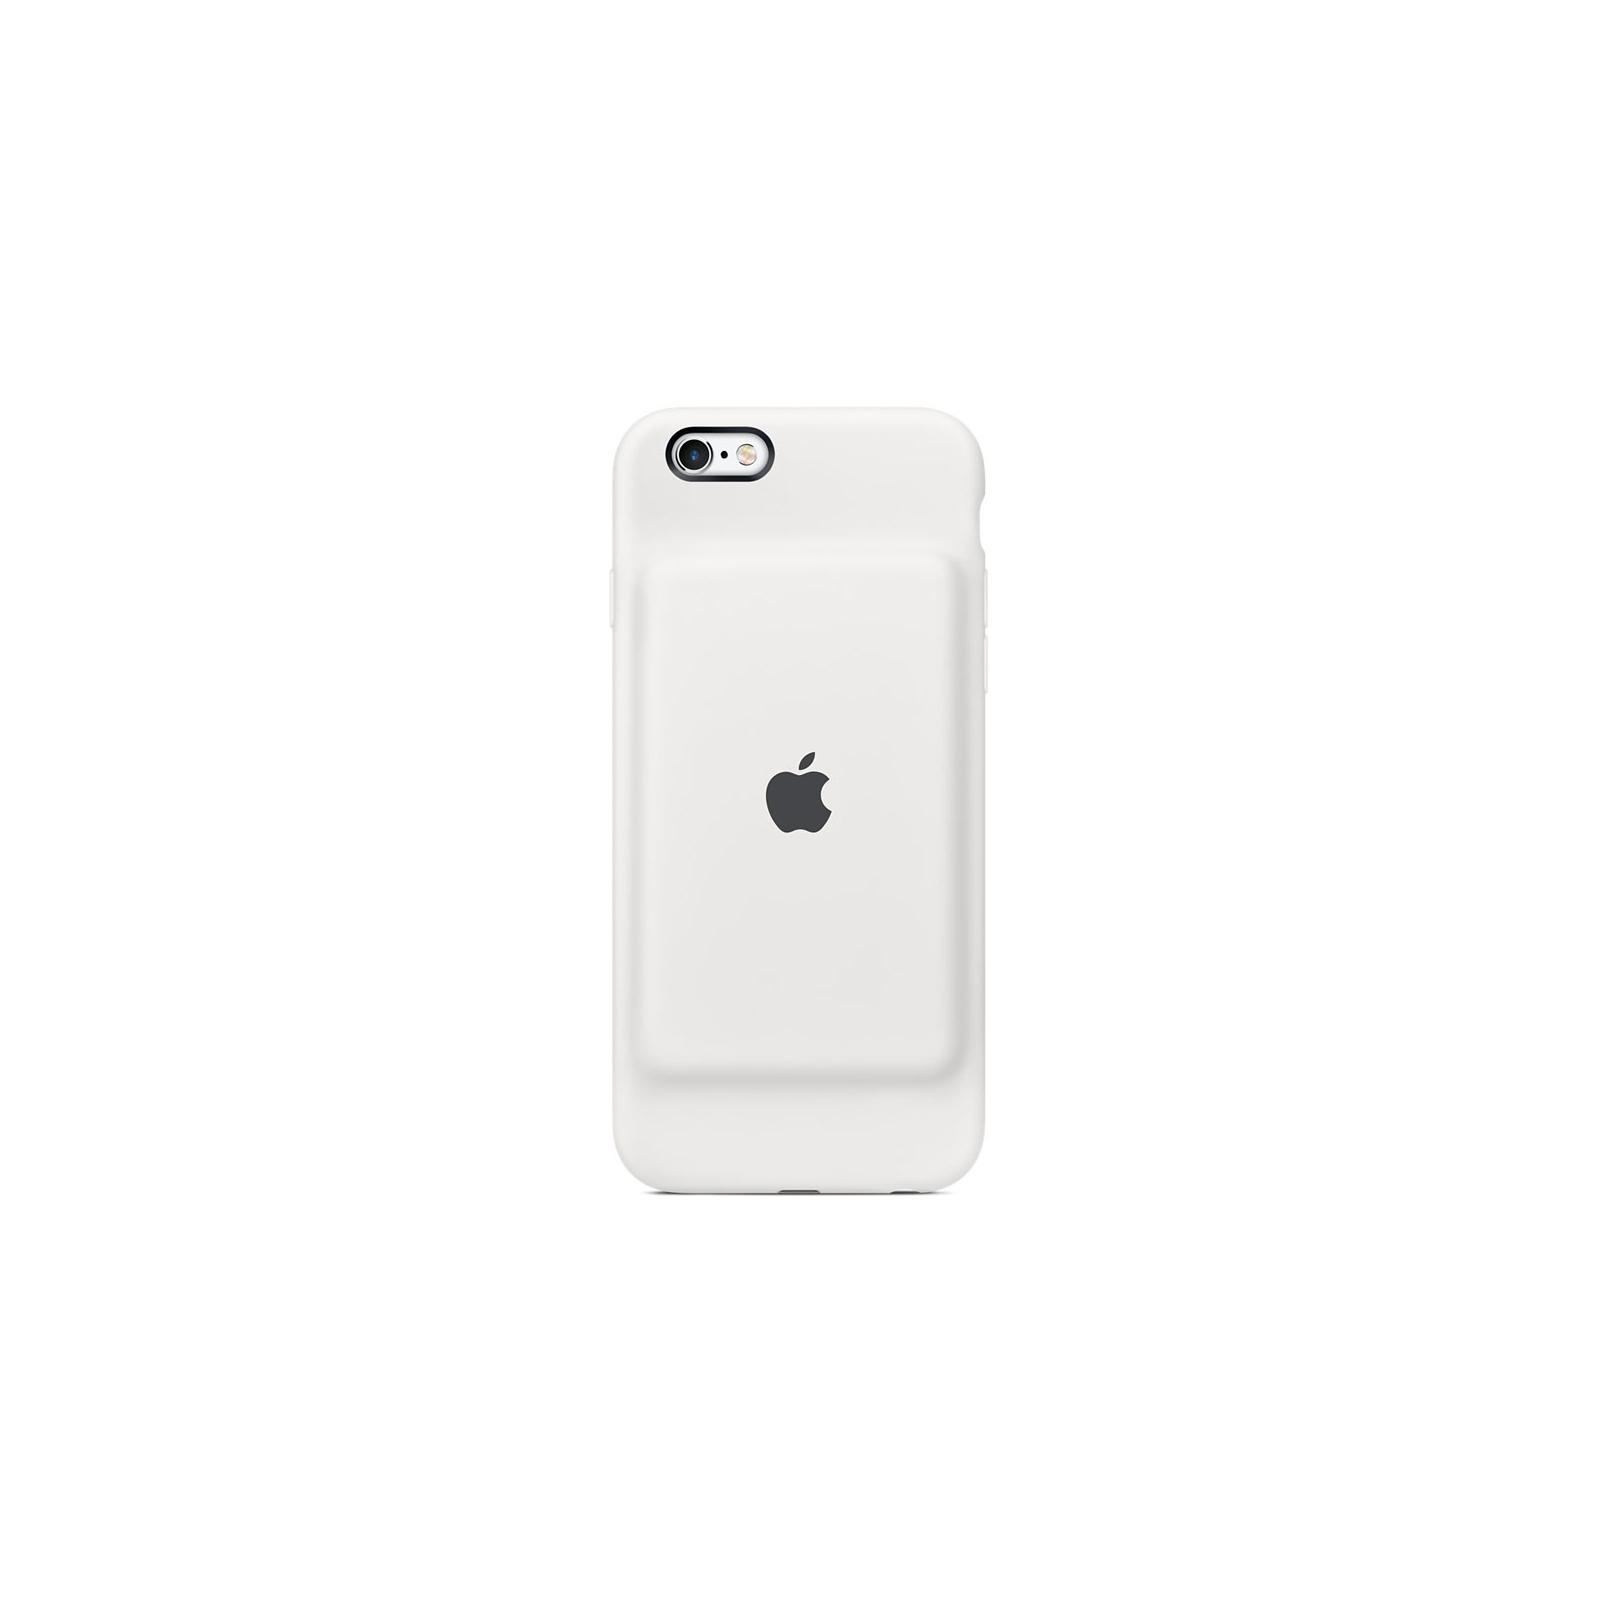 Чехол для моб. телефона Apple Smart Battery Case для iPhone 6/6s White (MGQM2ZM/A)